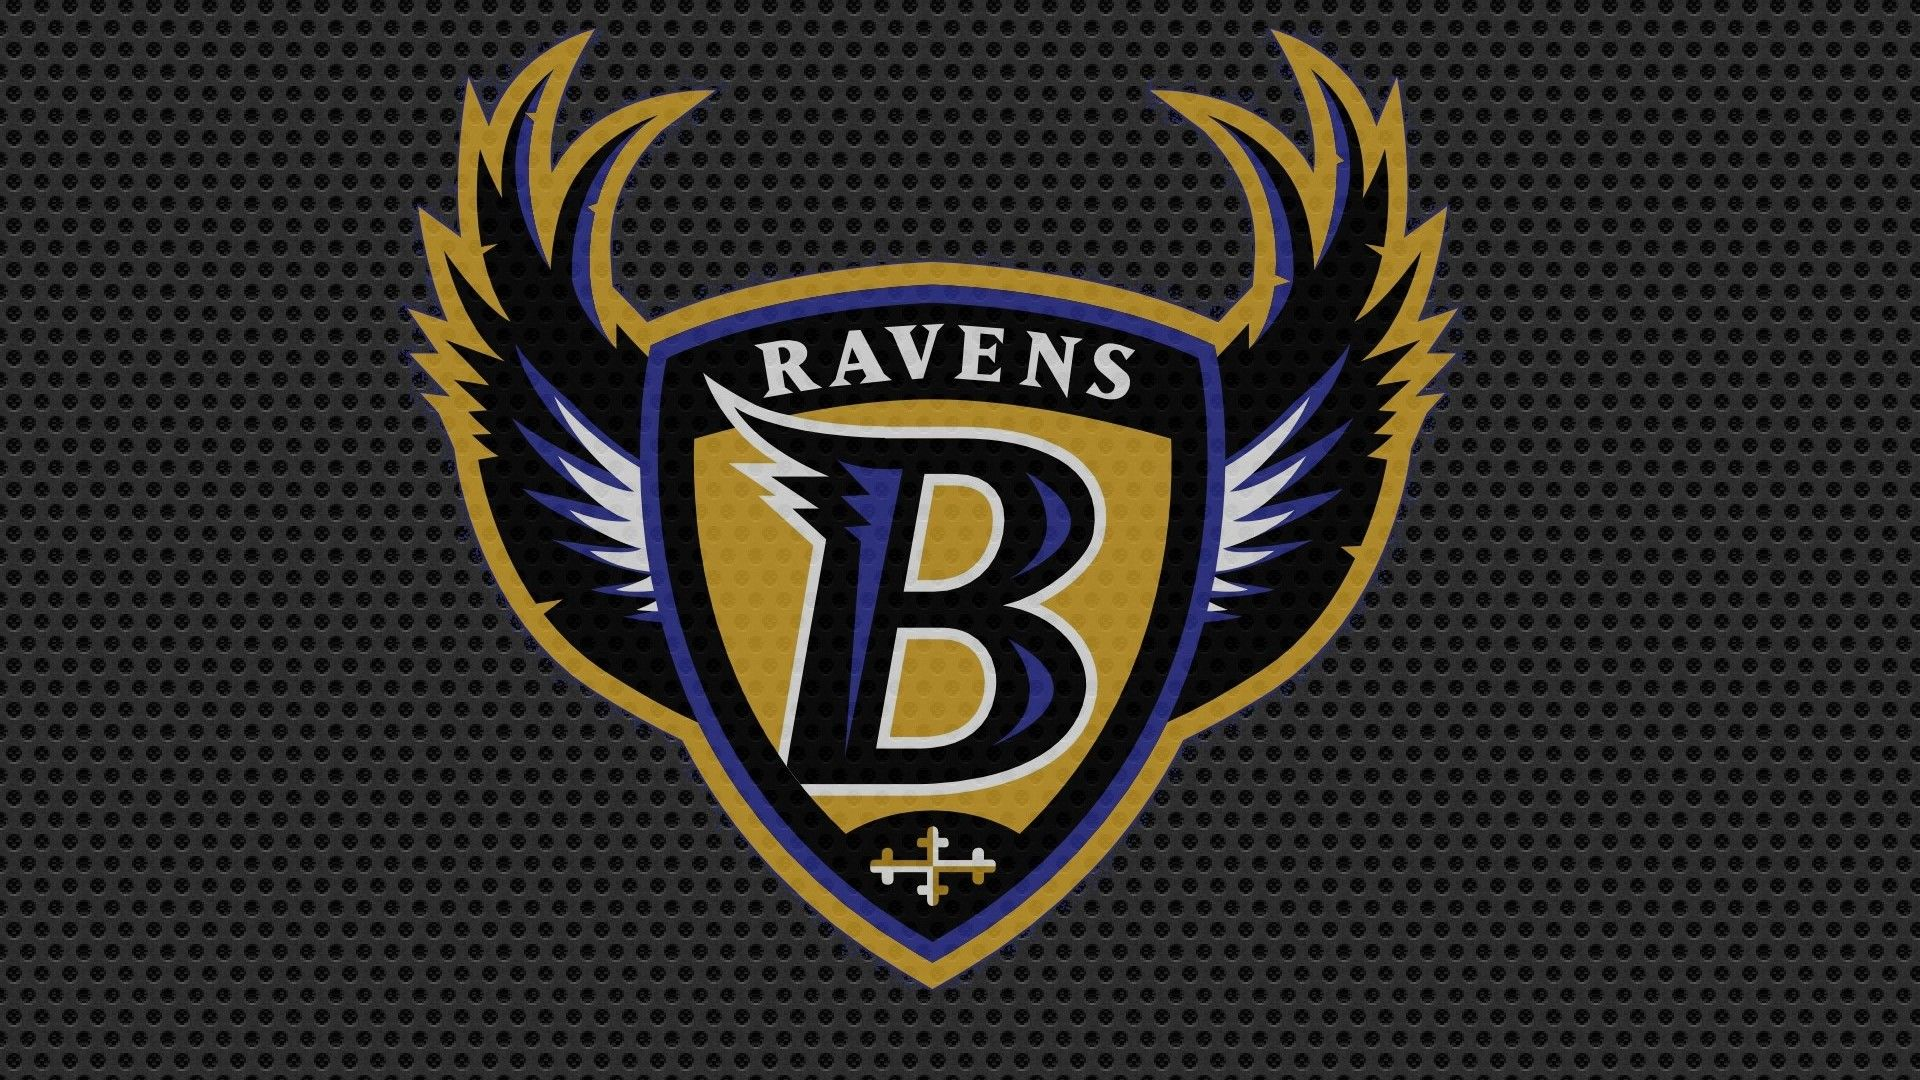 Backgrounds Baltimore Ravens Hd 2020 Nfl Football Wallpapers Baltimore Ravens Nfl Football Wallpaper Raven